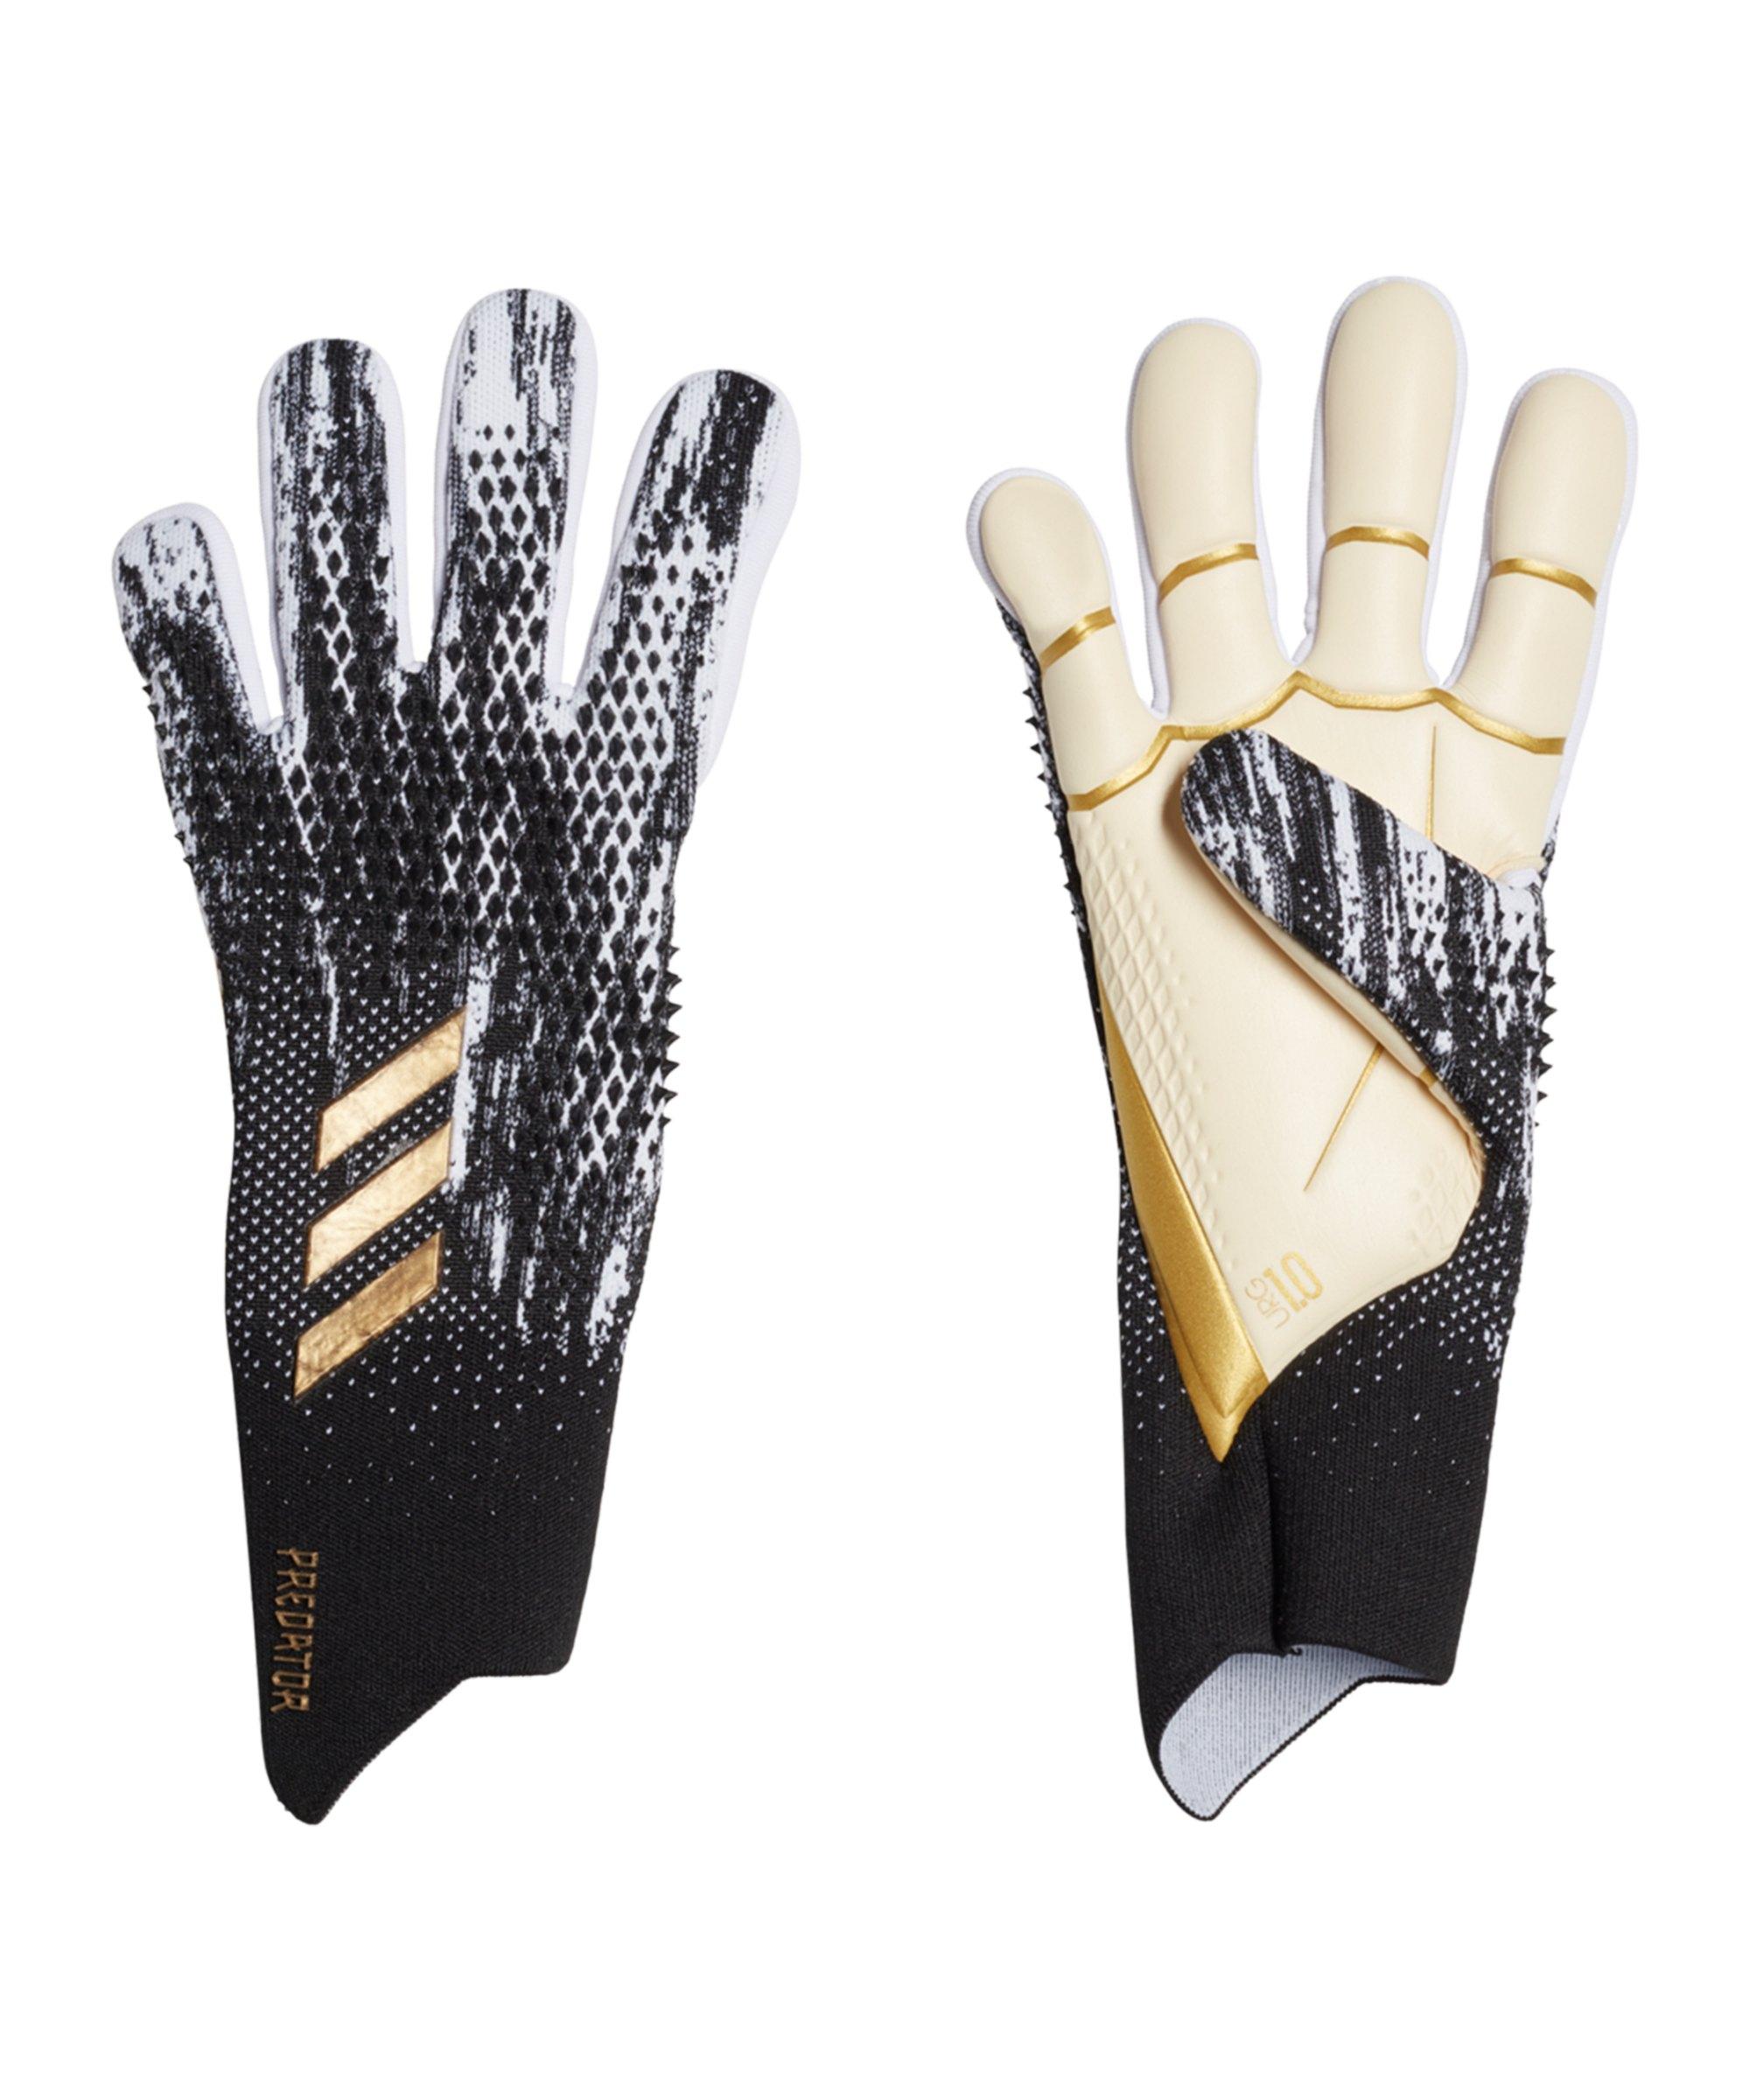 adidas Predator Pro Inflight Promo TW-Handschuh Schwarz - schwarz